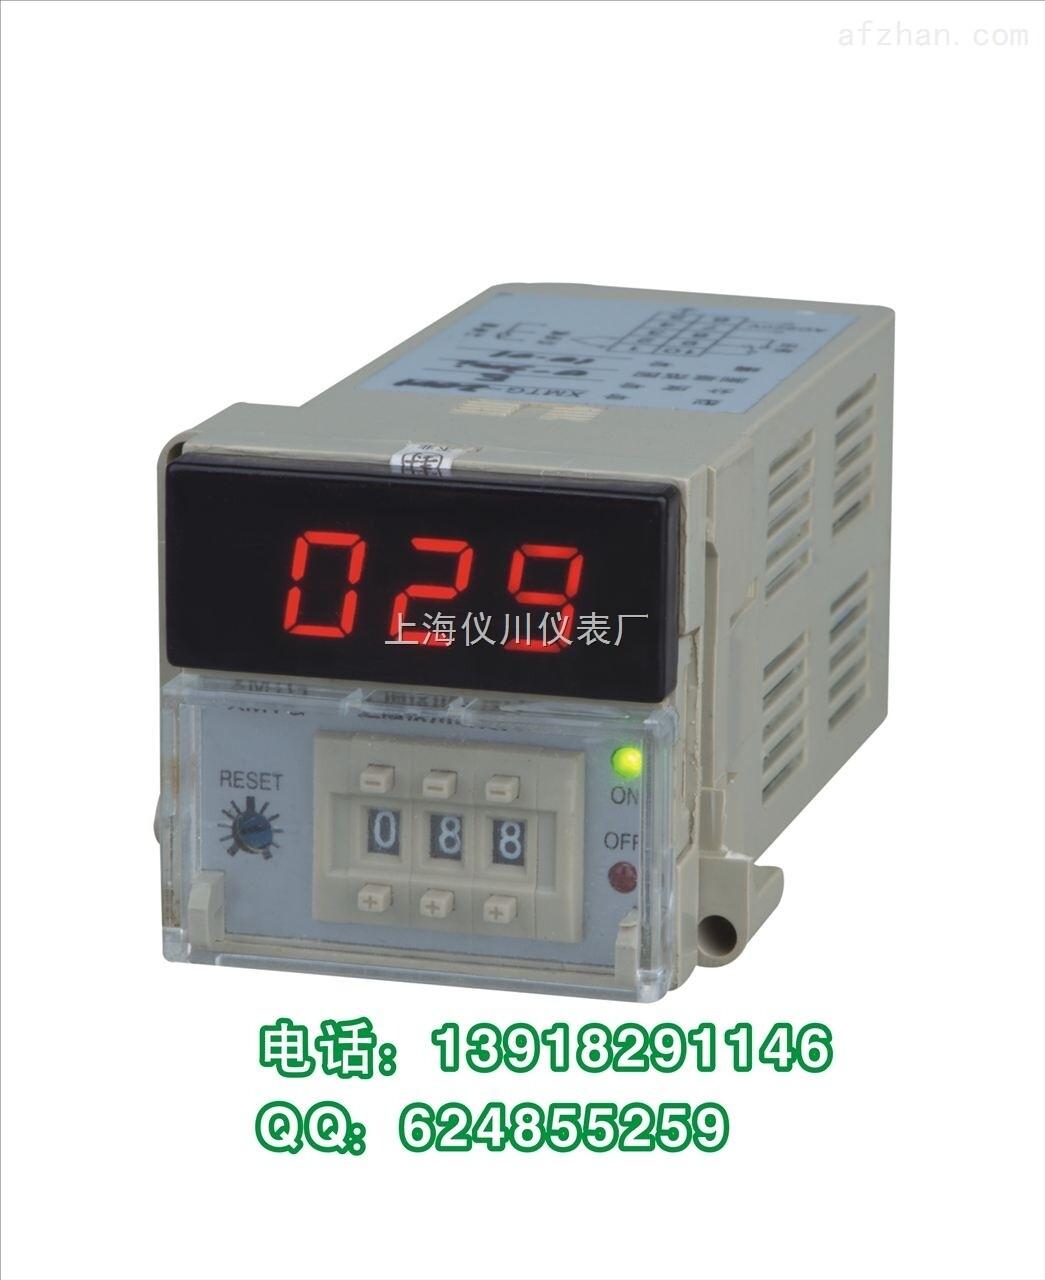 xmtd-2001 温度控制仪